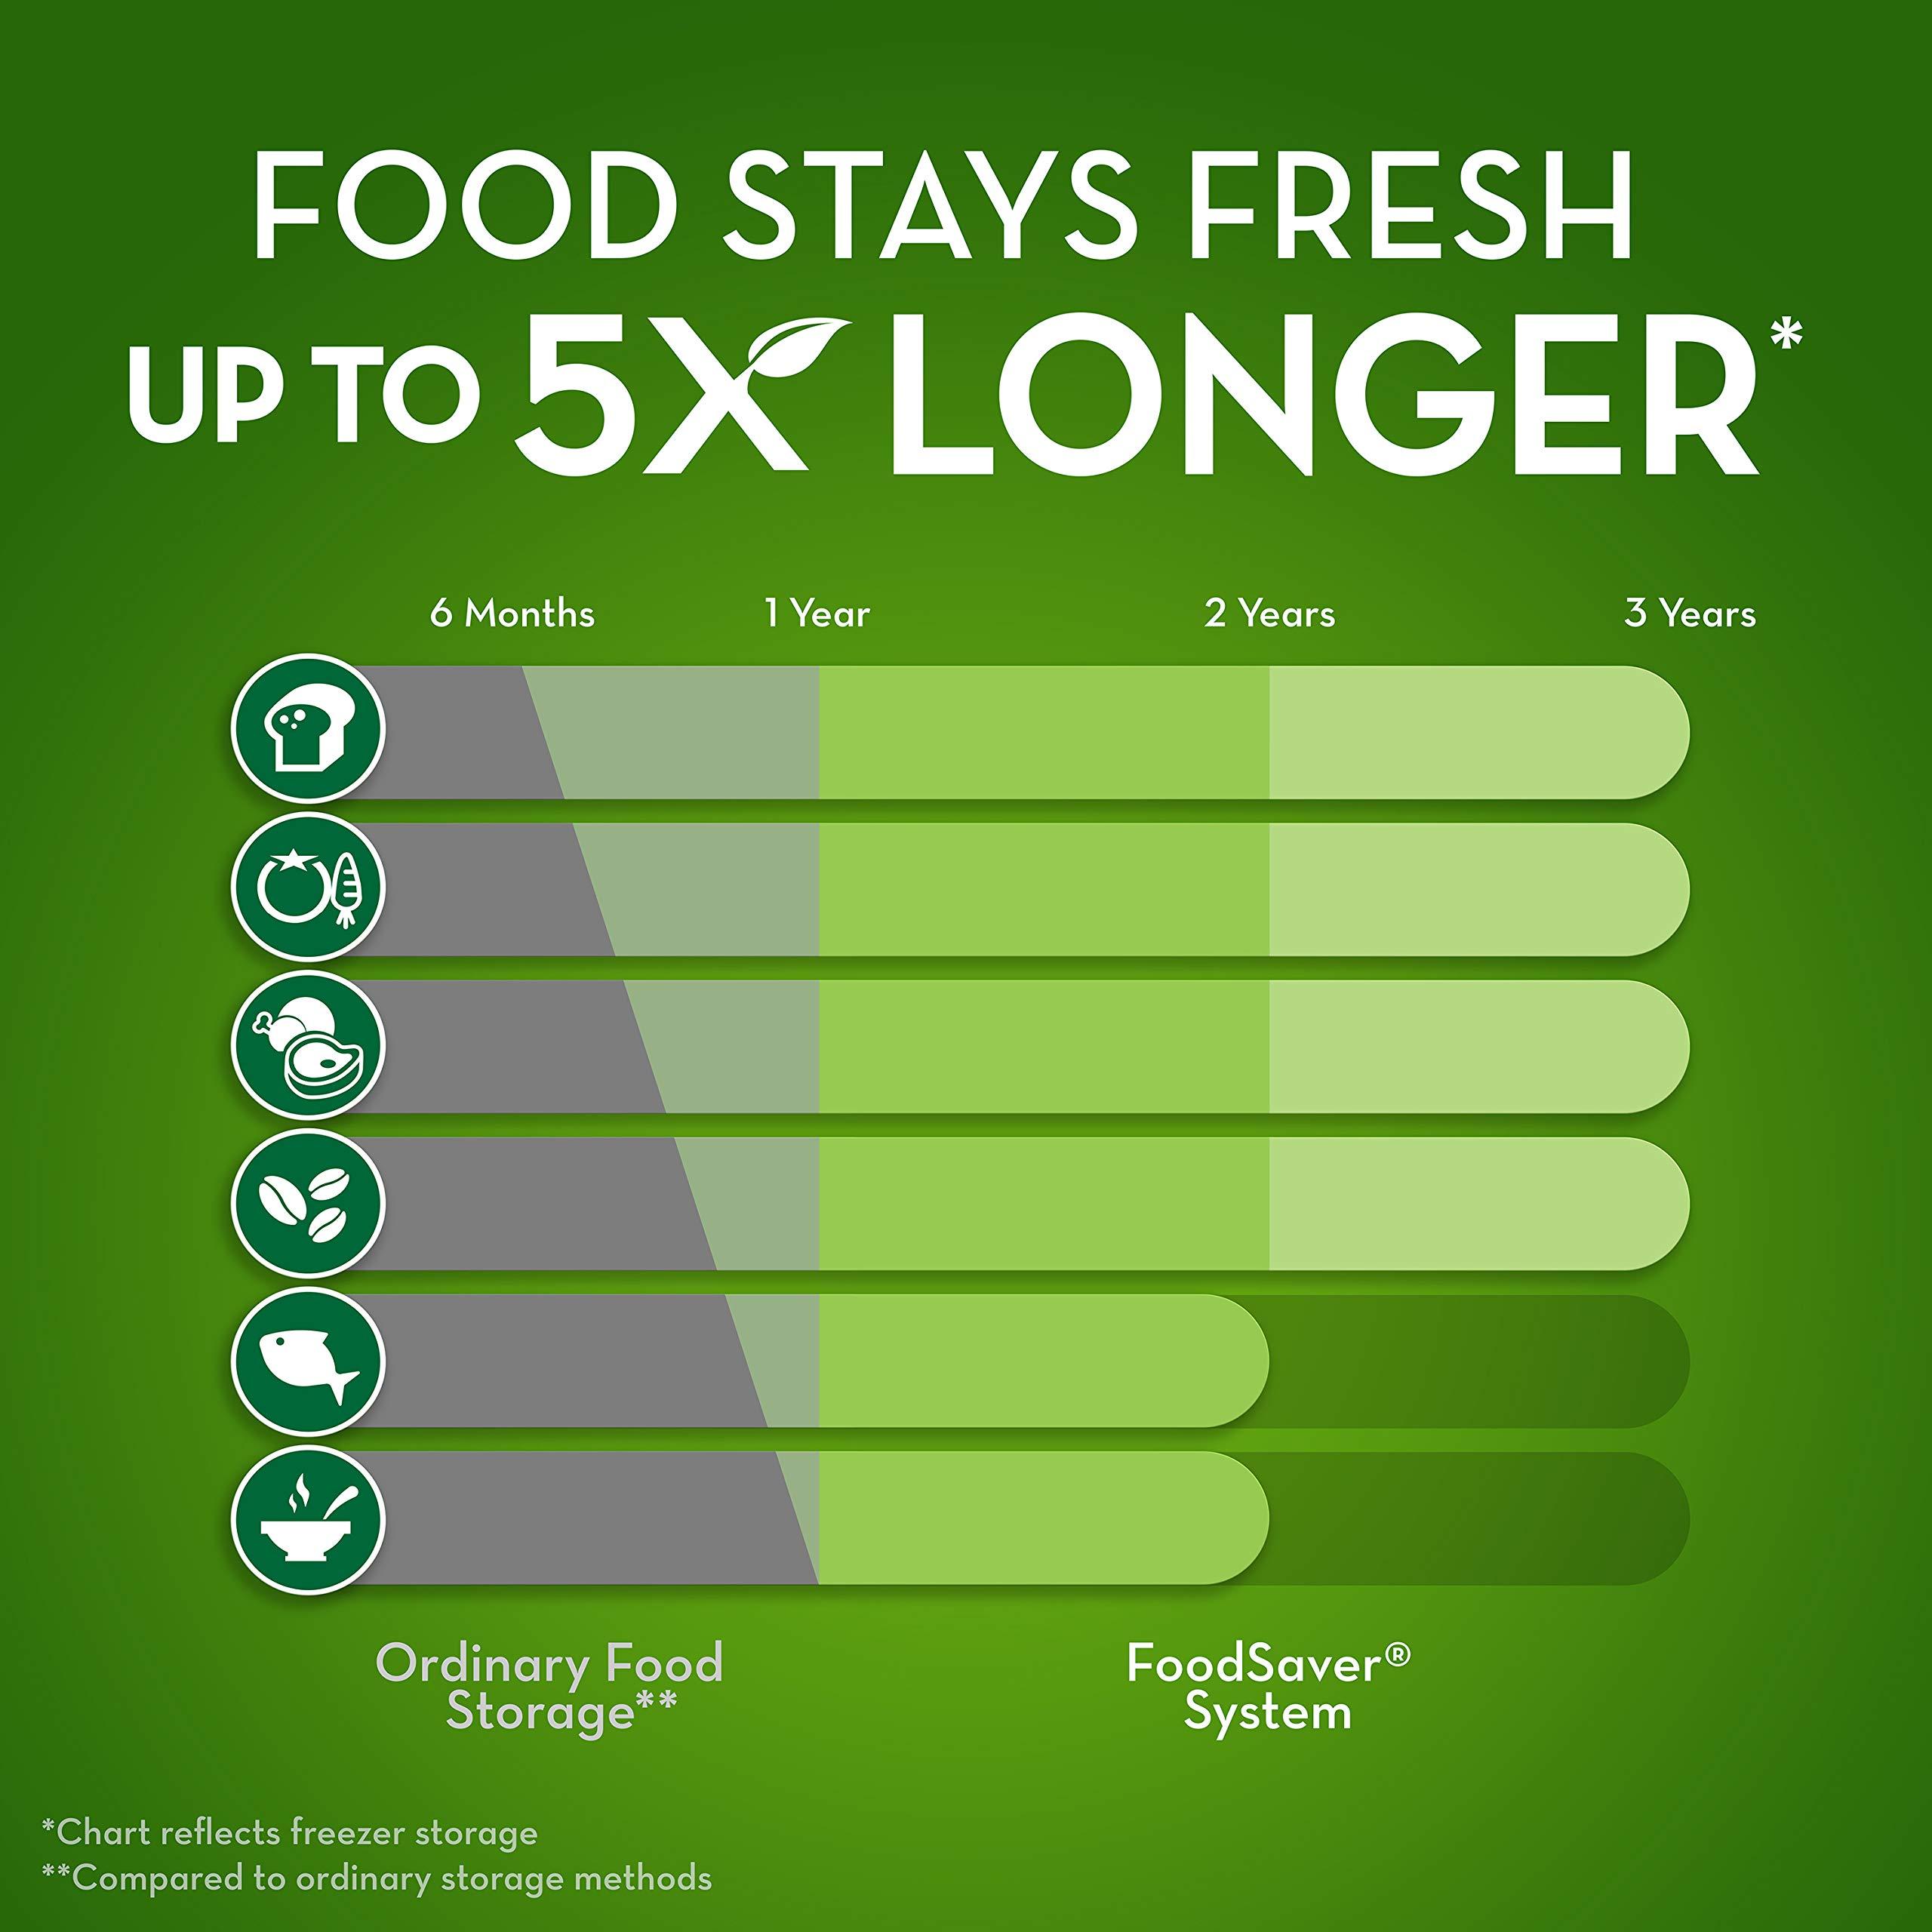 foodsaver v2244 how to use